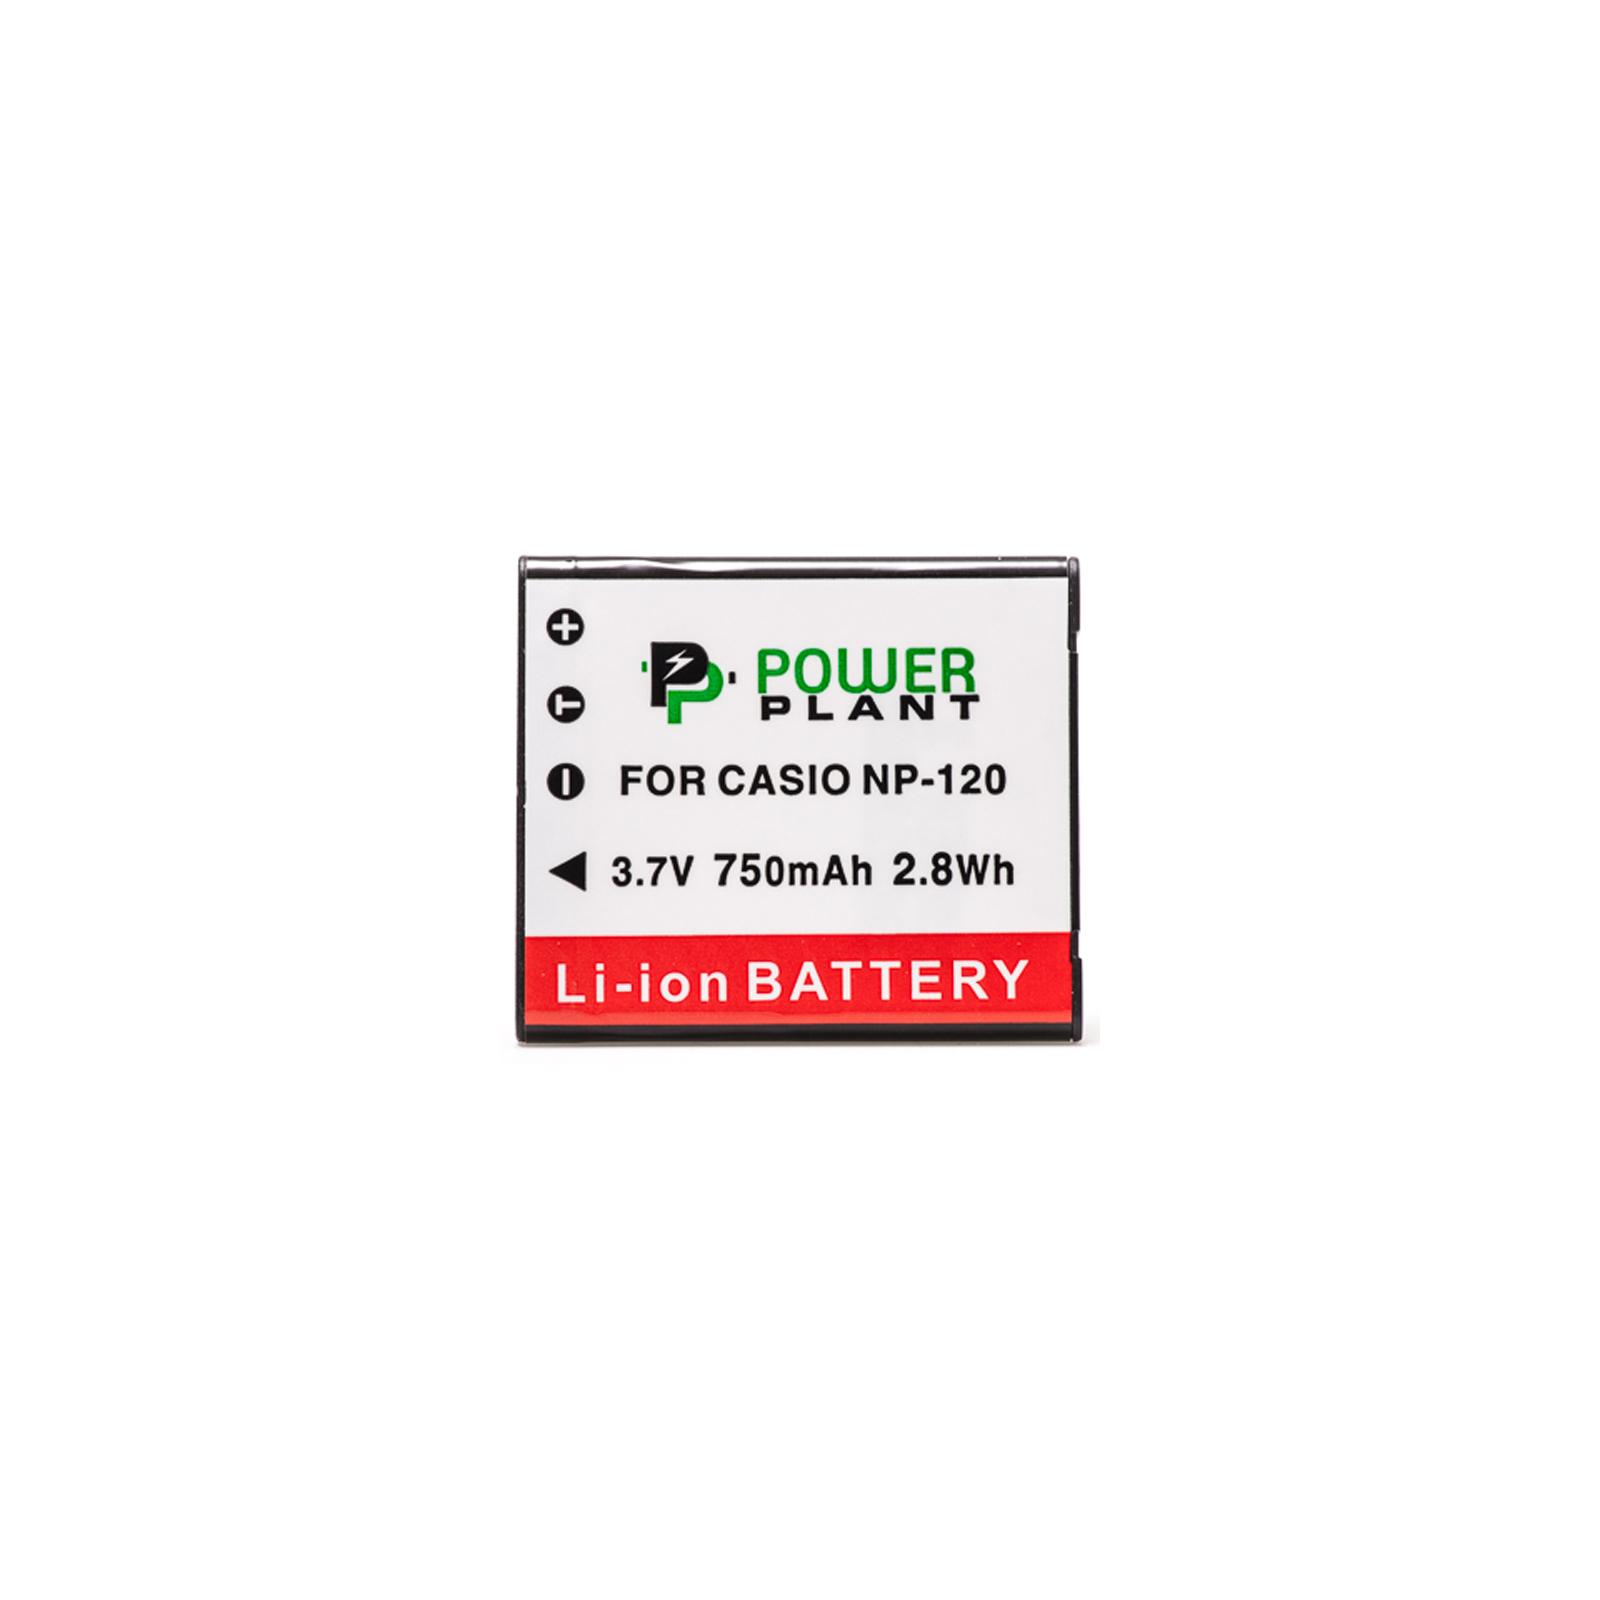 Аккумулятор к фото/видео PowerPlant Casio NP-120 (DV00DV1312)